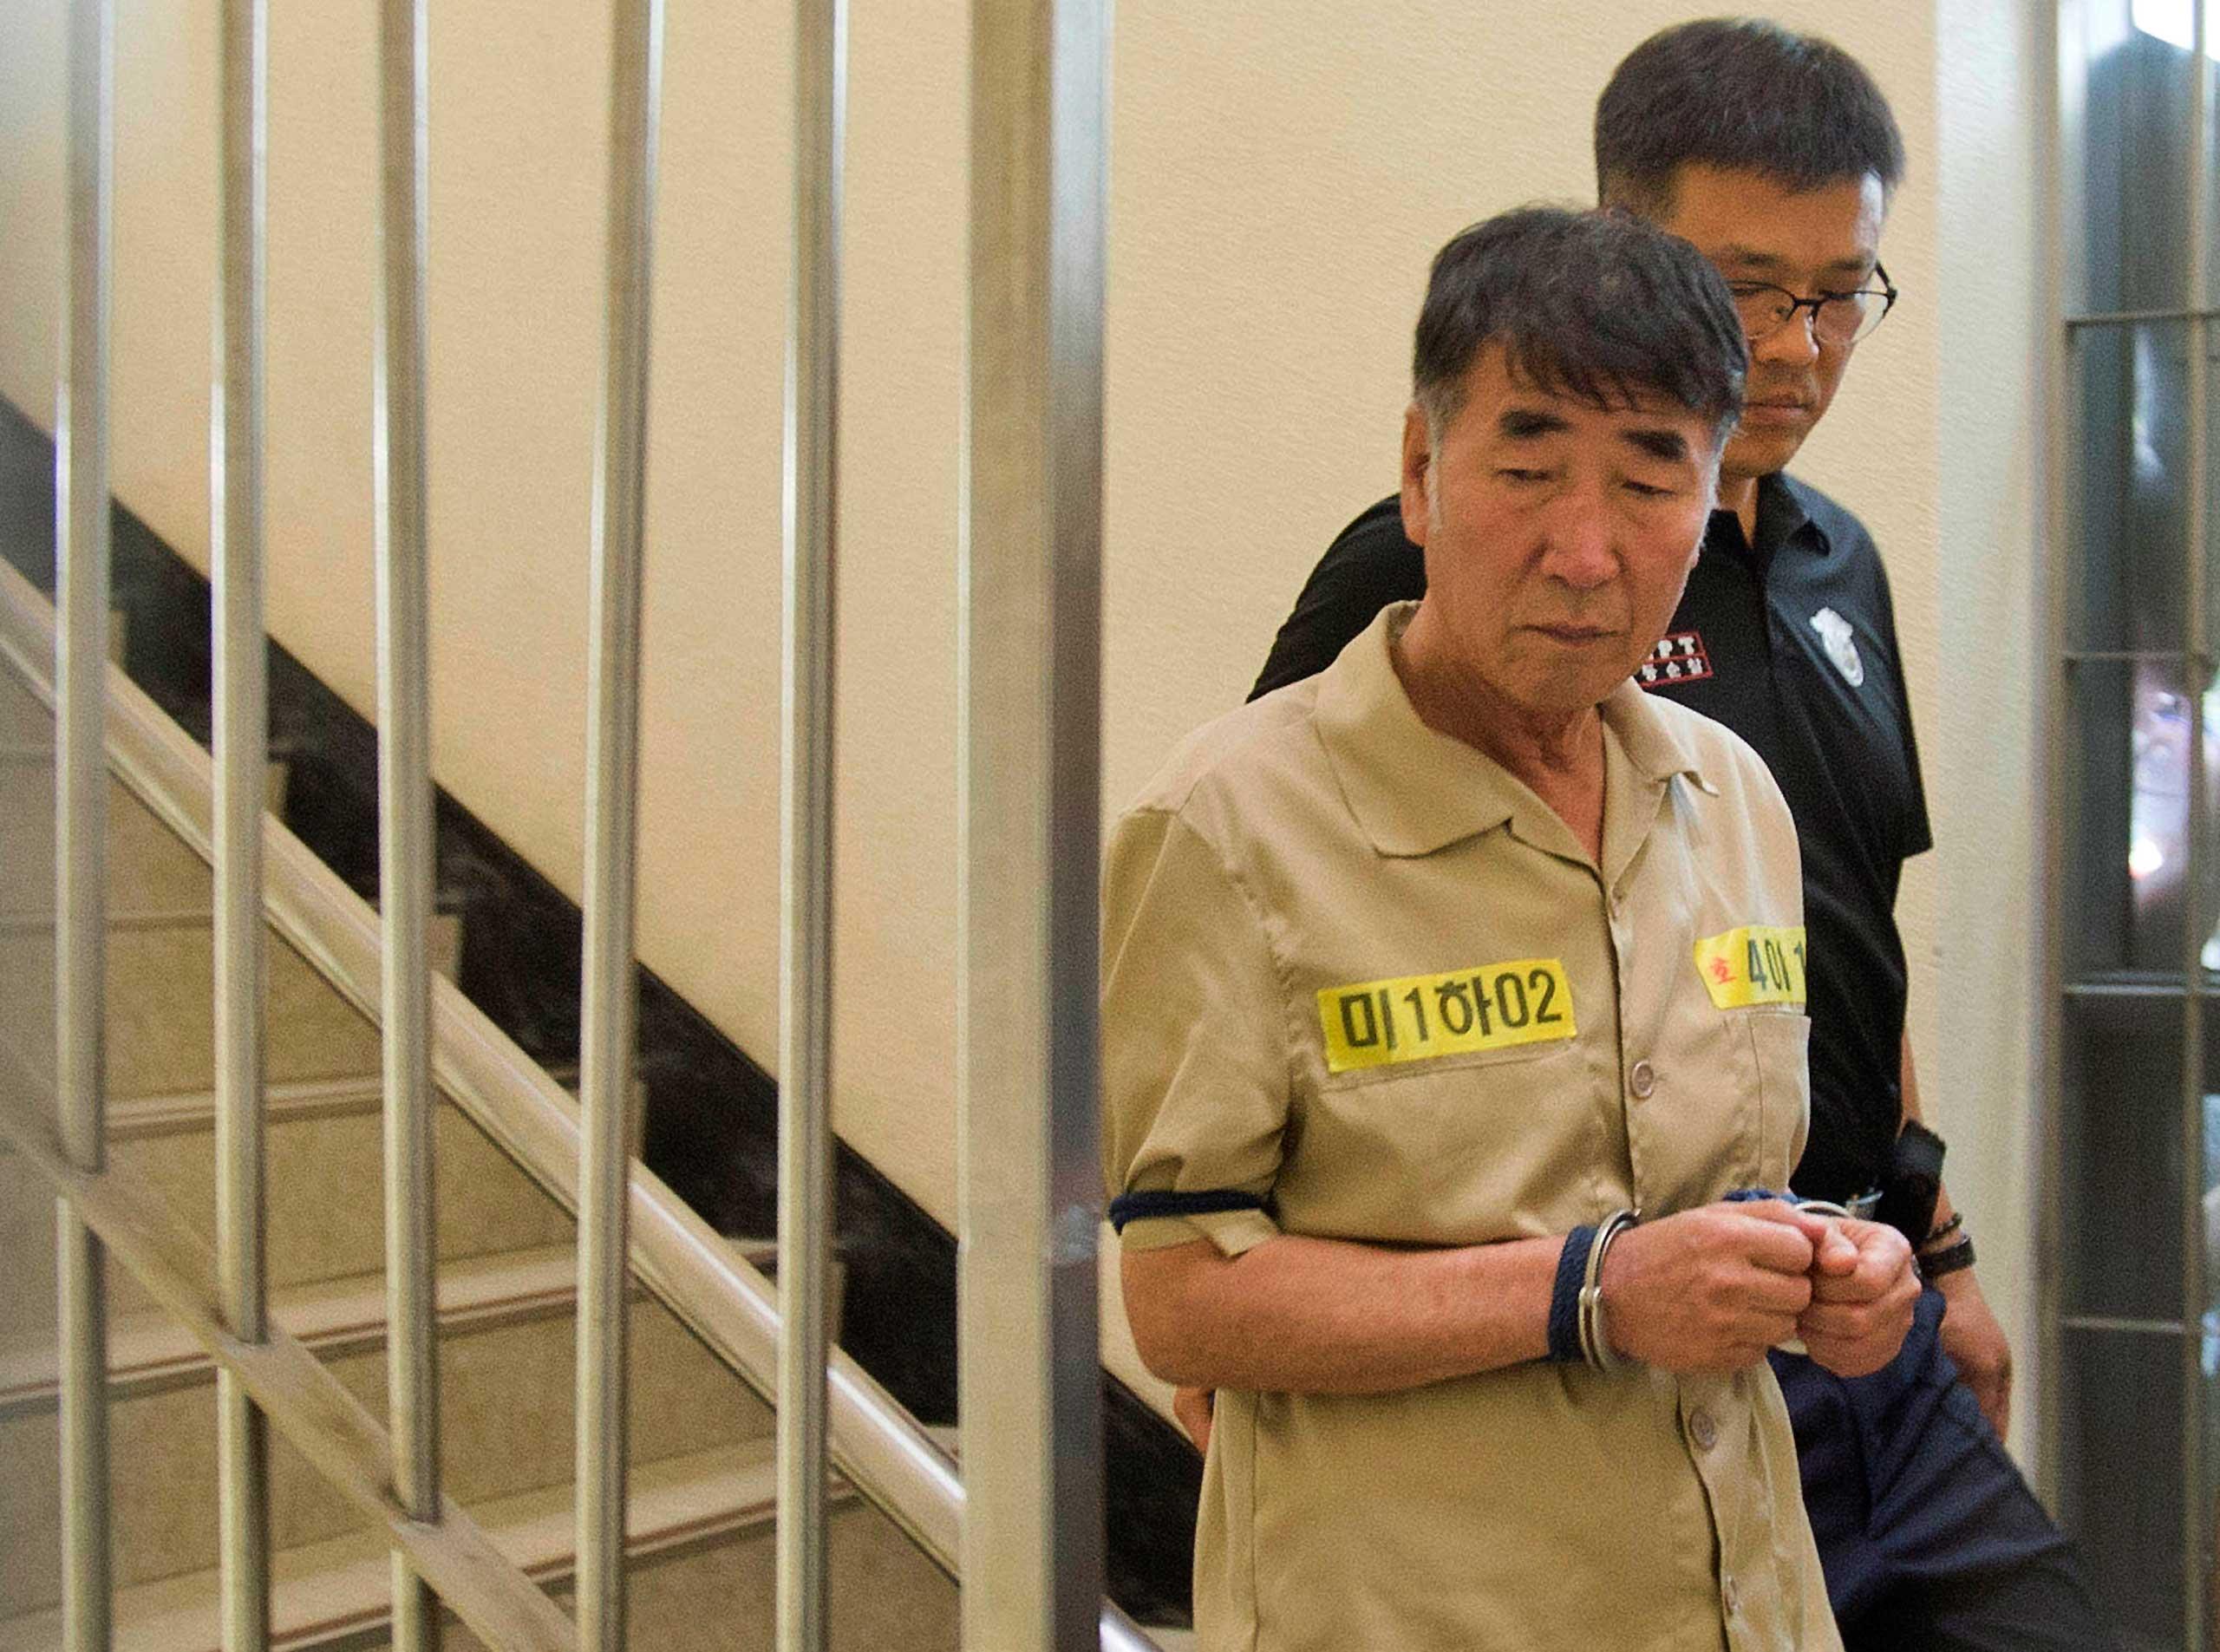 Lee Joon-seok, the captain of the sunken South Korean ferry Sewol, arrives at Gwangju District Court in Gwangju, South Korea, June 10, 2014.